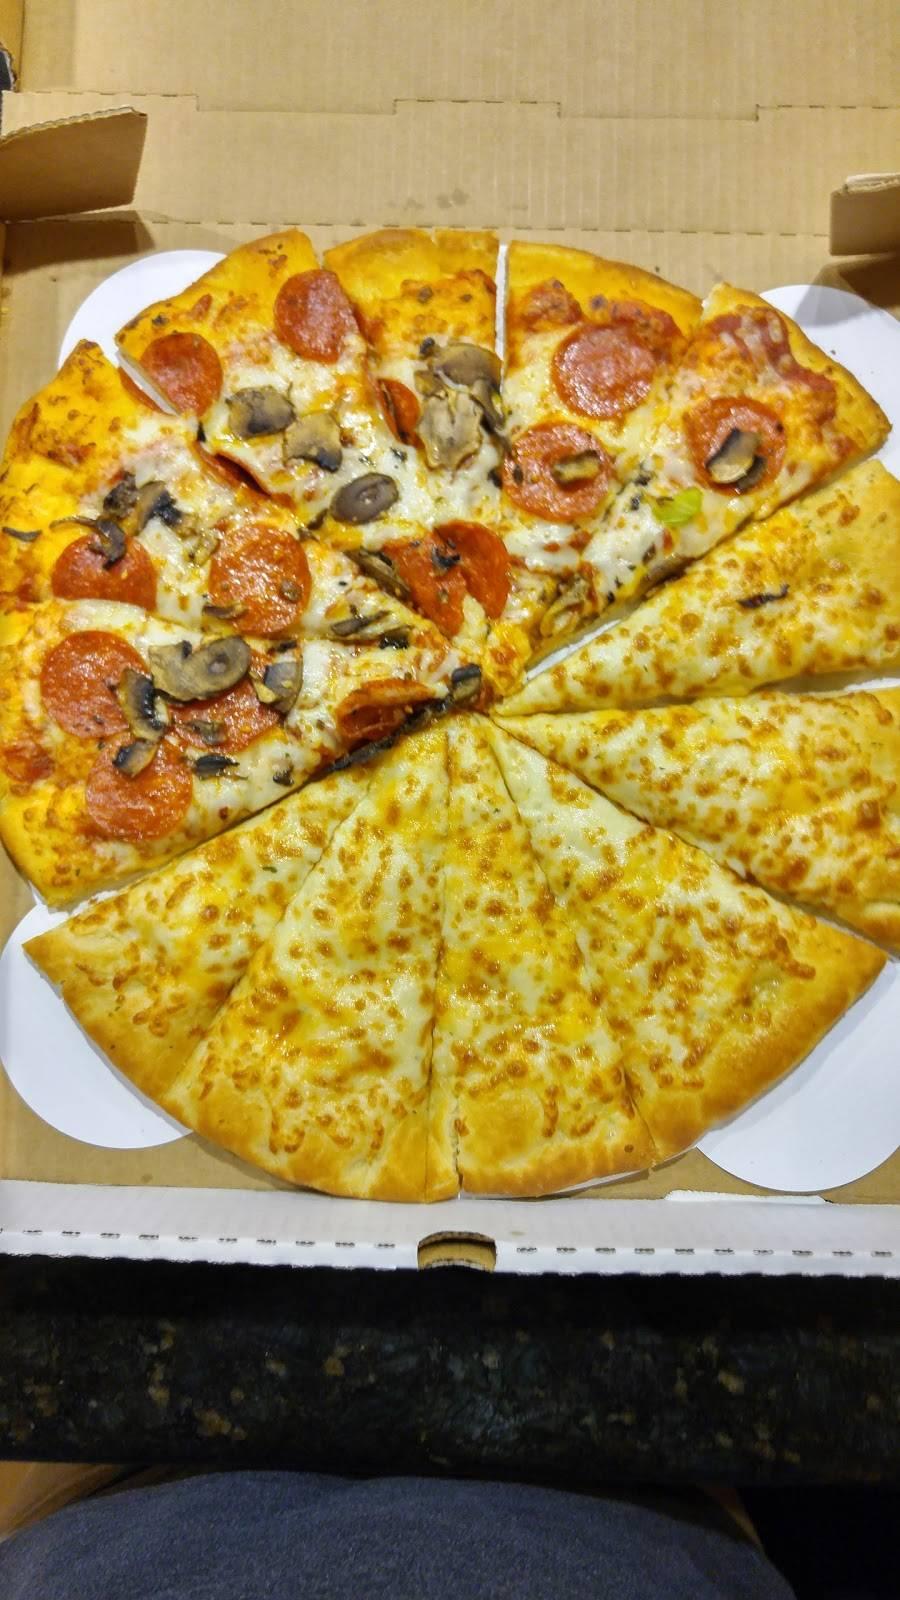 Leonardis Pizza Co.   restaurant   42600 Jackson St, Indio, CA 92203, USA   7603426457 OR +1 760-342-6457